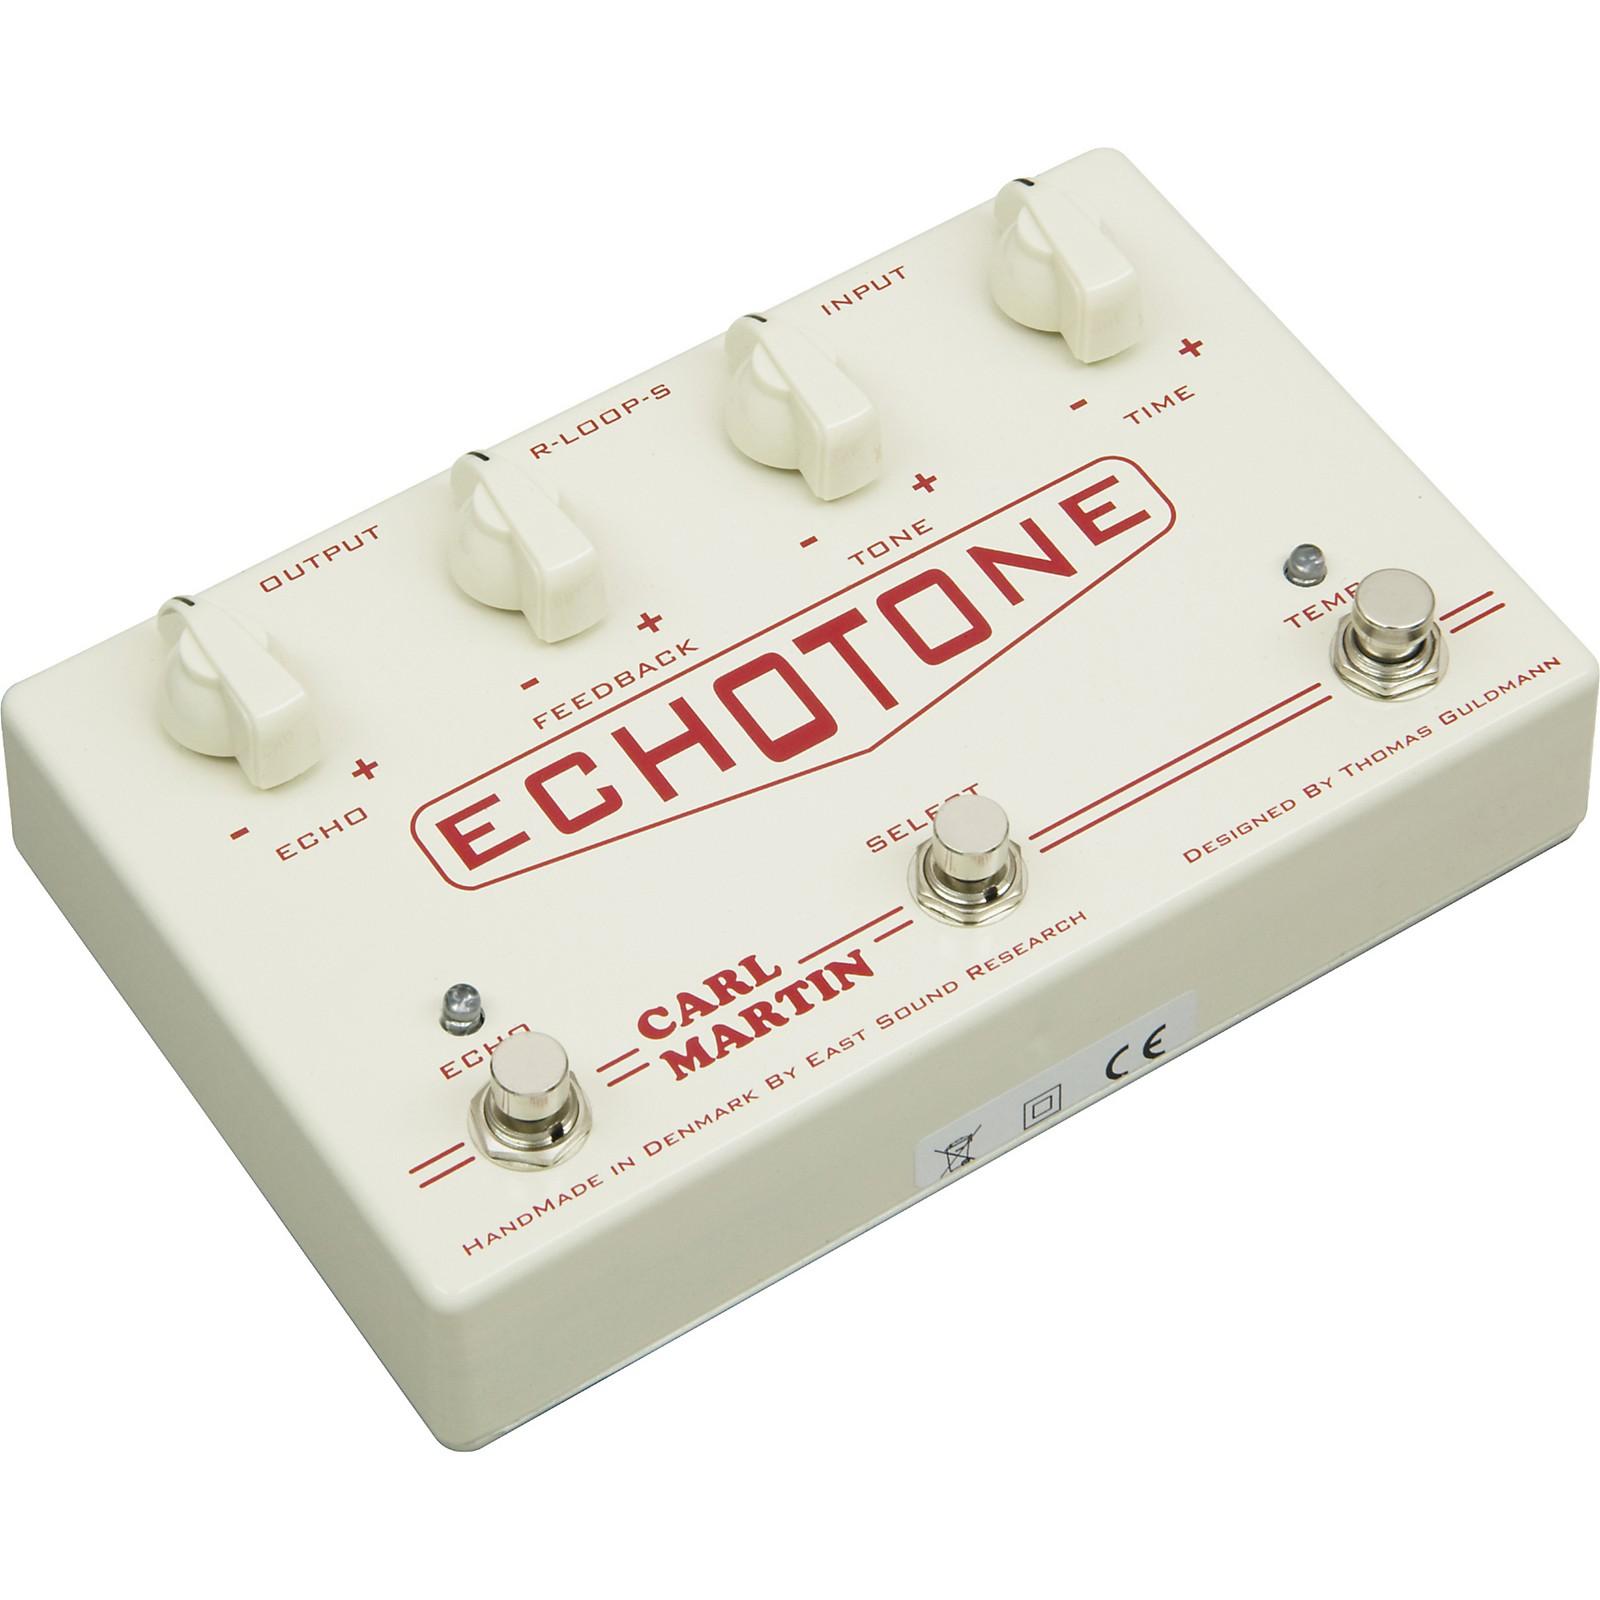 Carl Martin EchoTone Delay Guitar Effects Pedal